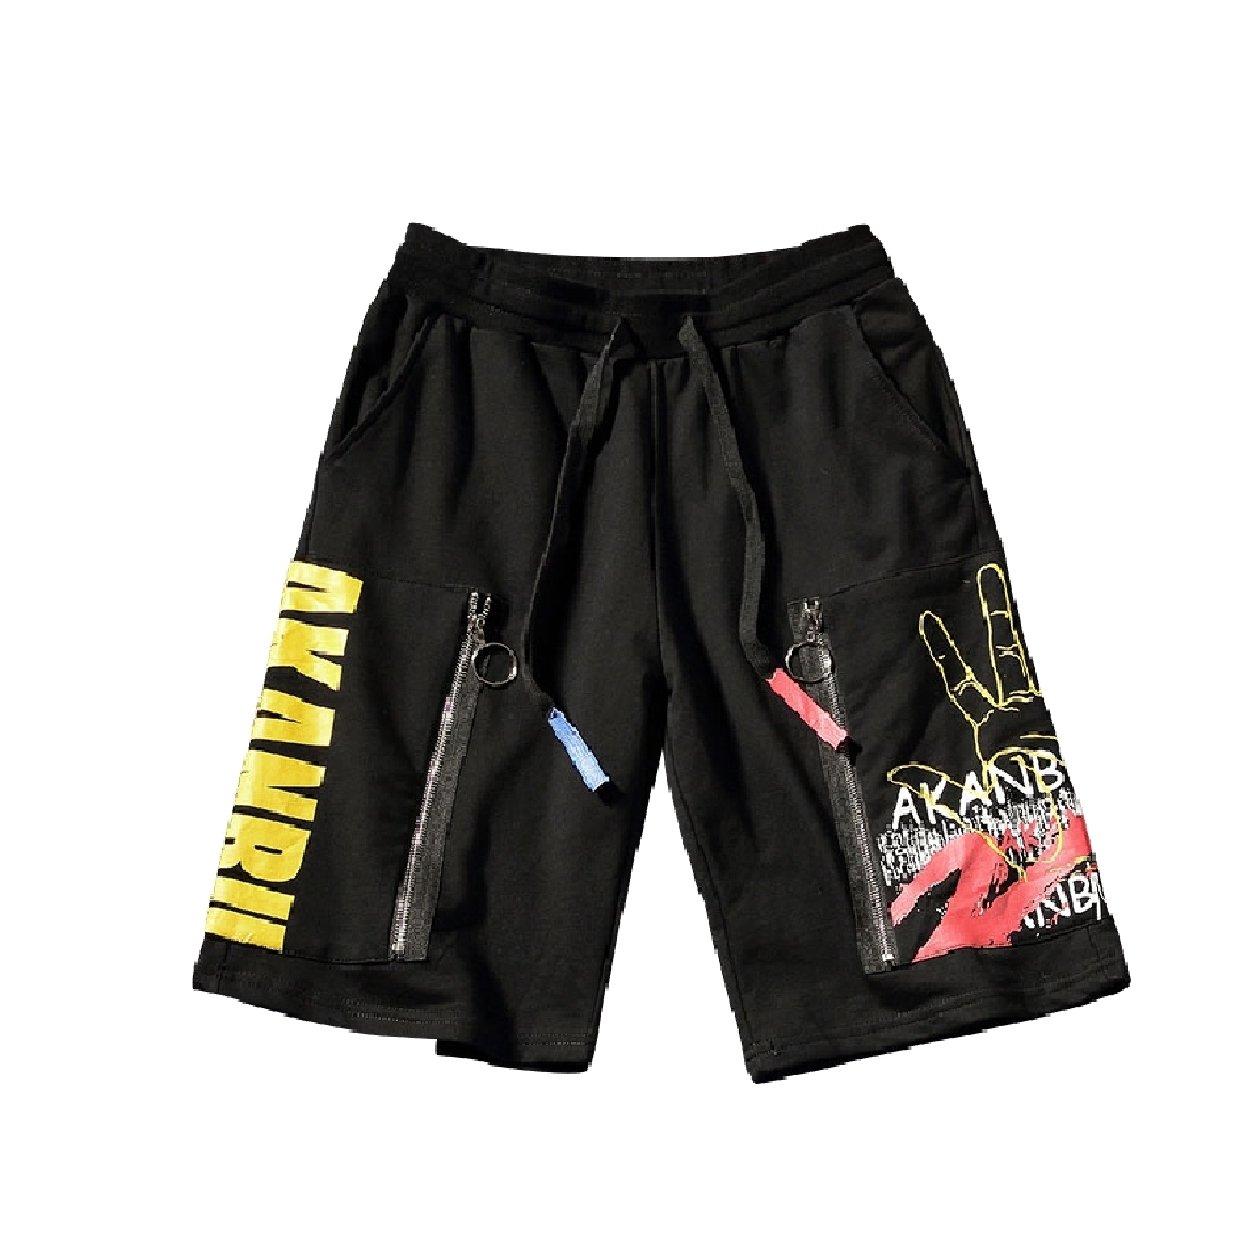 Zimaes-Men Zip Straight-Fit Fine Cotton Elastic Waist Midi Shorts Black XL by Zimaes-Men (Image #5)